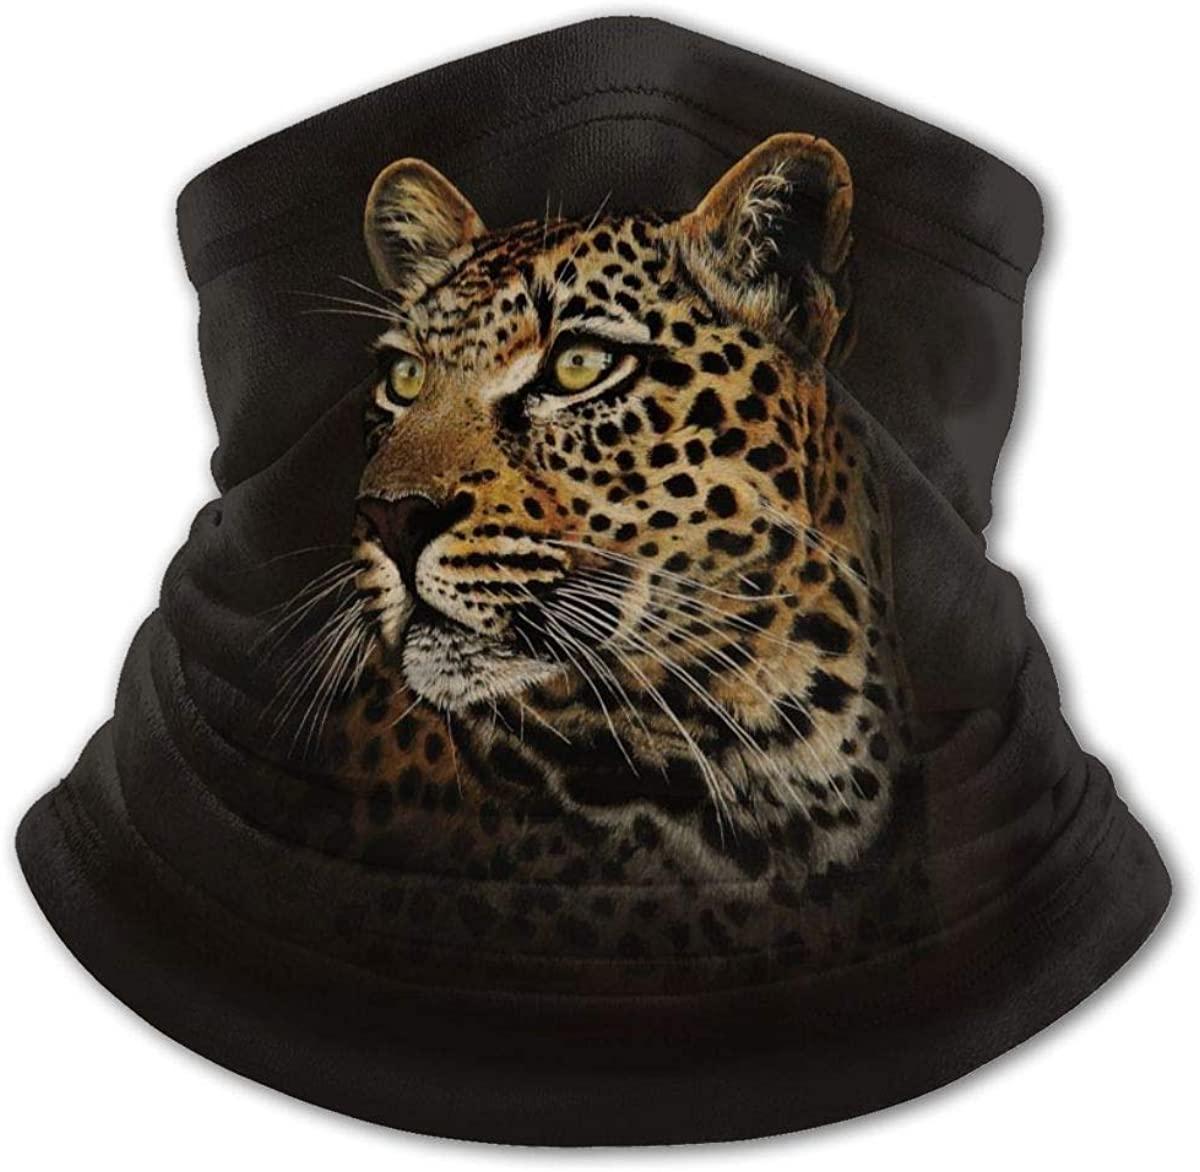 Leopard Headwear For Girls And Boys, Head Wrap, Neck Gaiter, Headband, Tenn Fishing Mask, Magic Scarf, Tube Mask, Face Bandana Mask For Camping Running Cycling